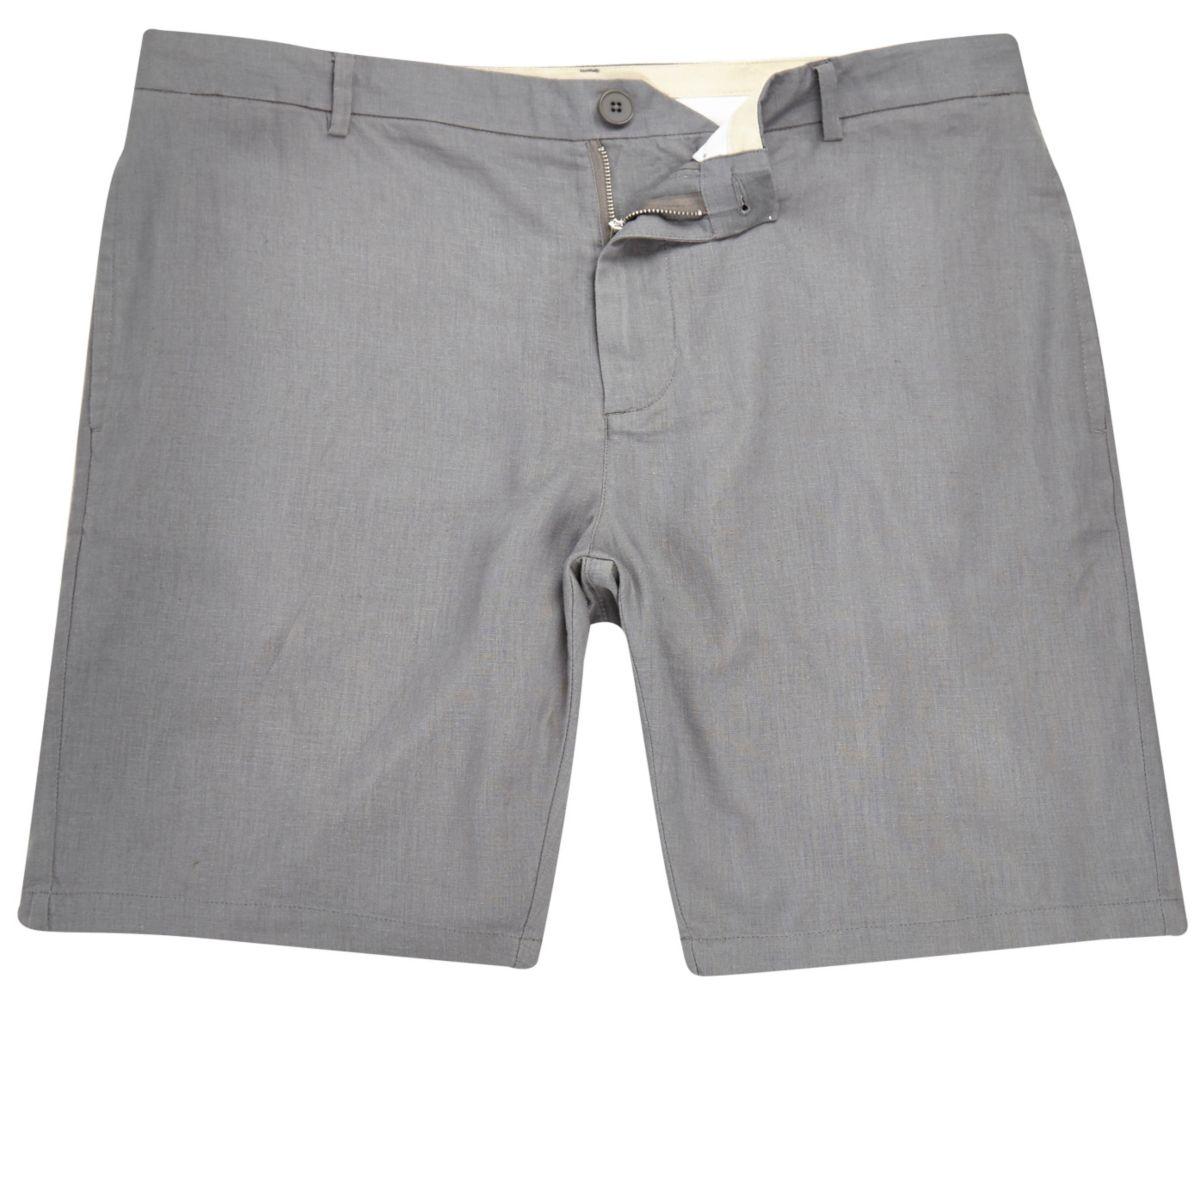 Grey linen slim fit chino shorts